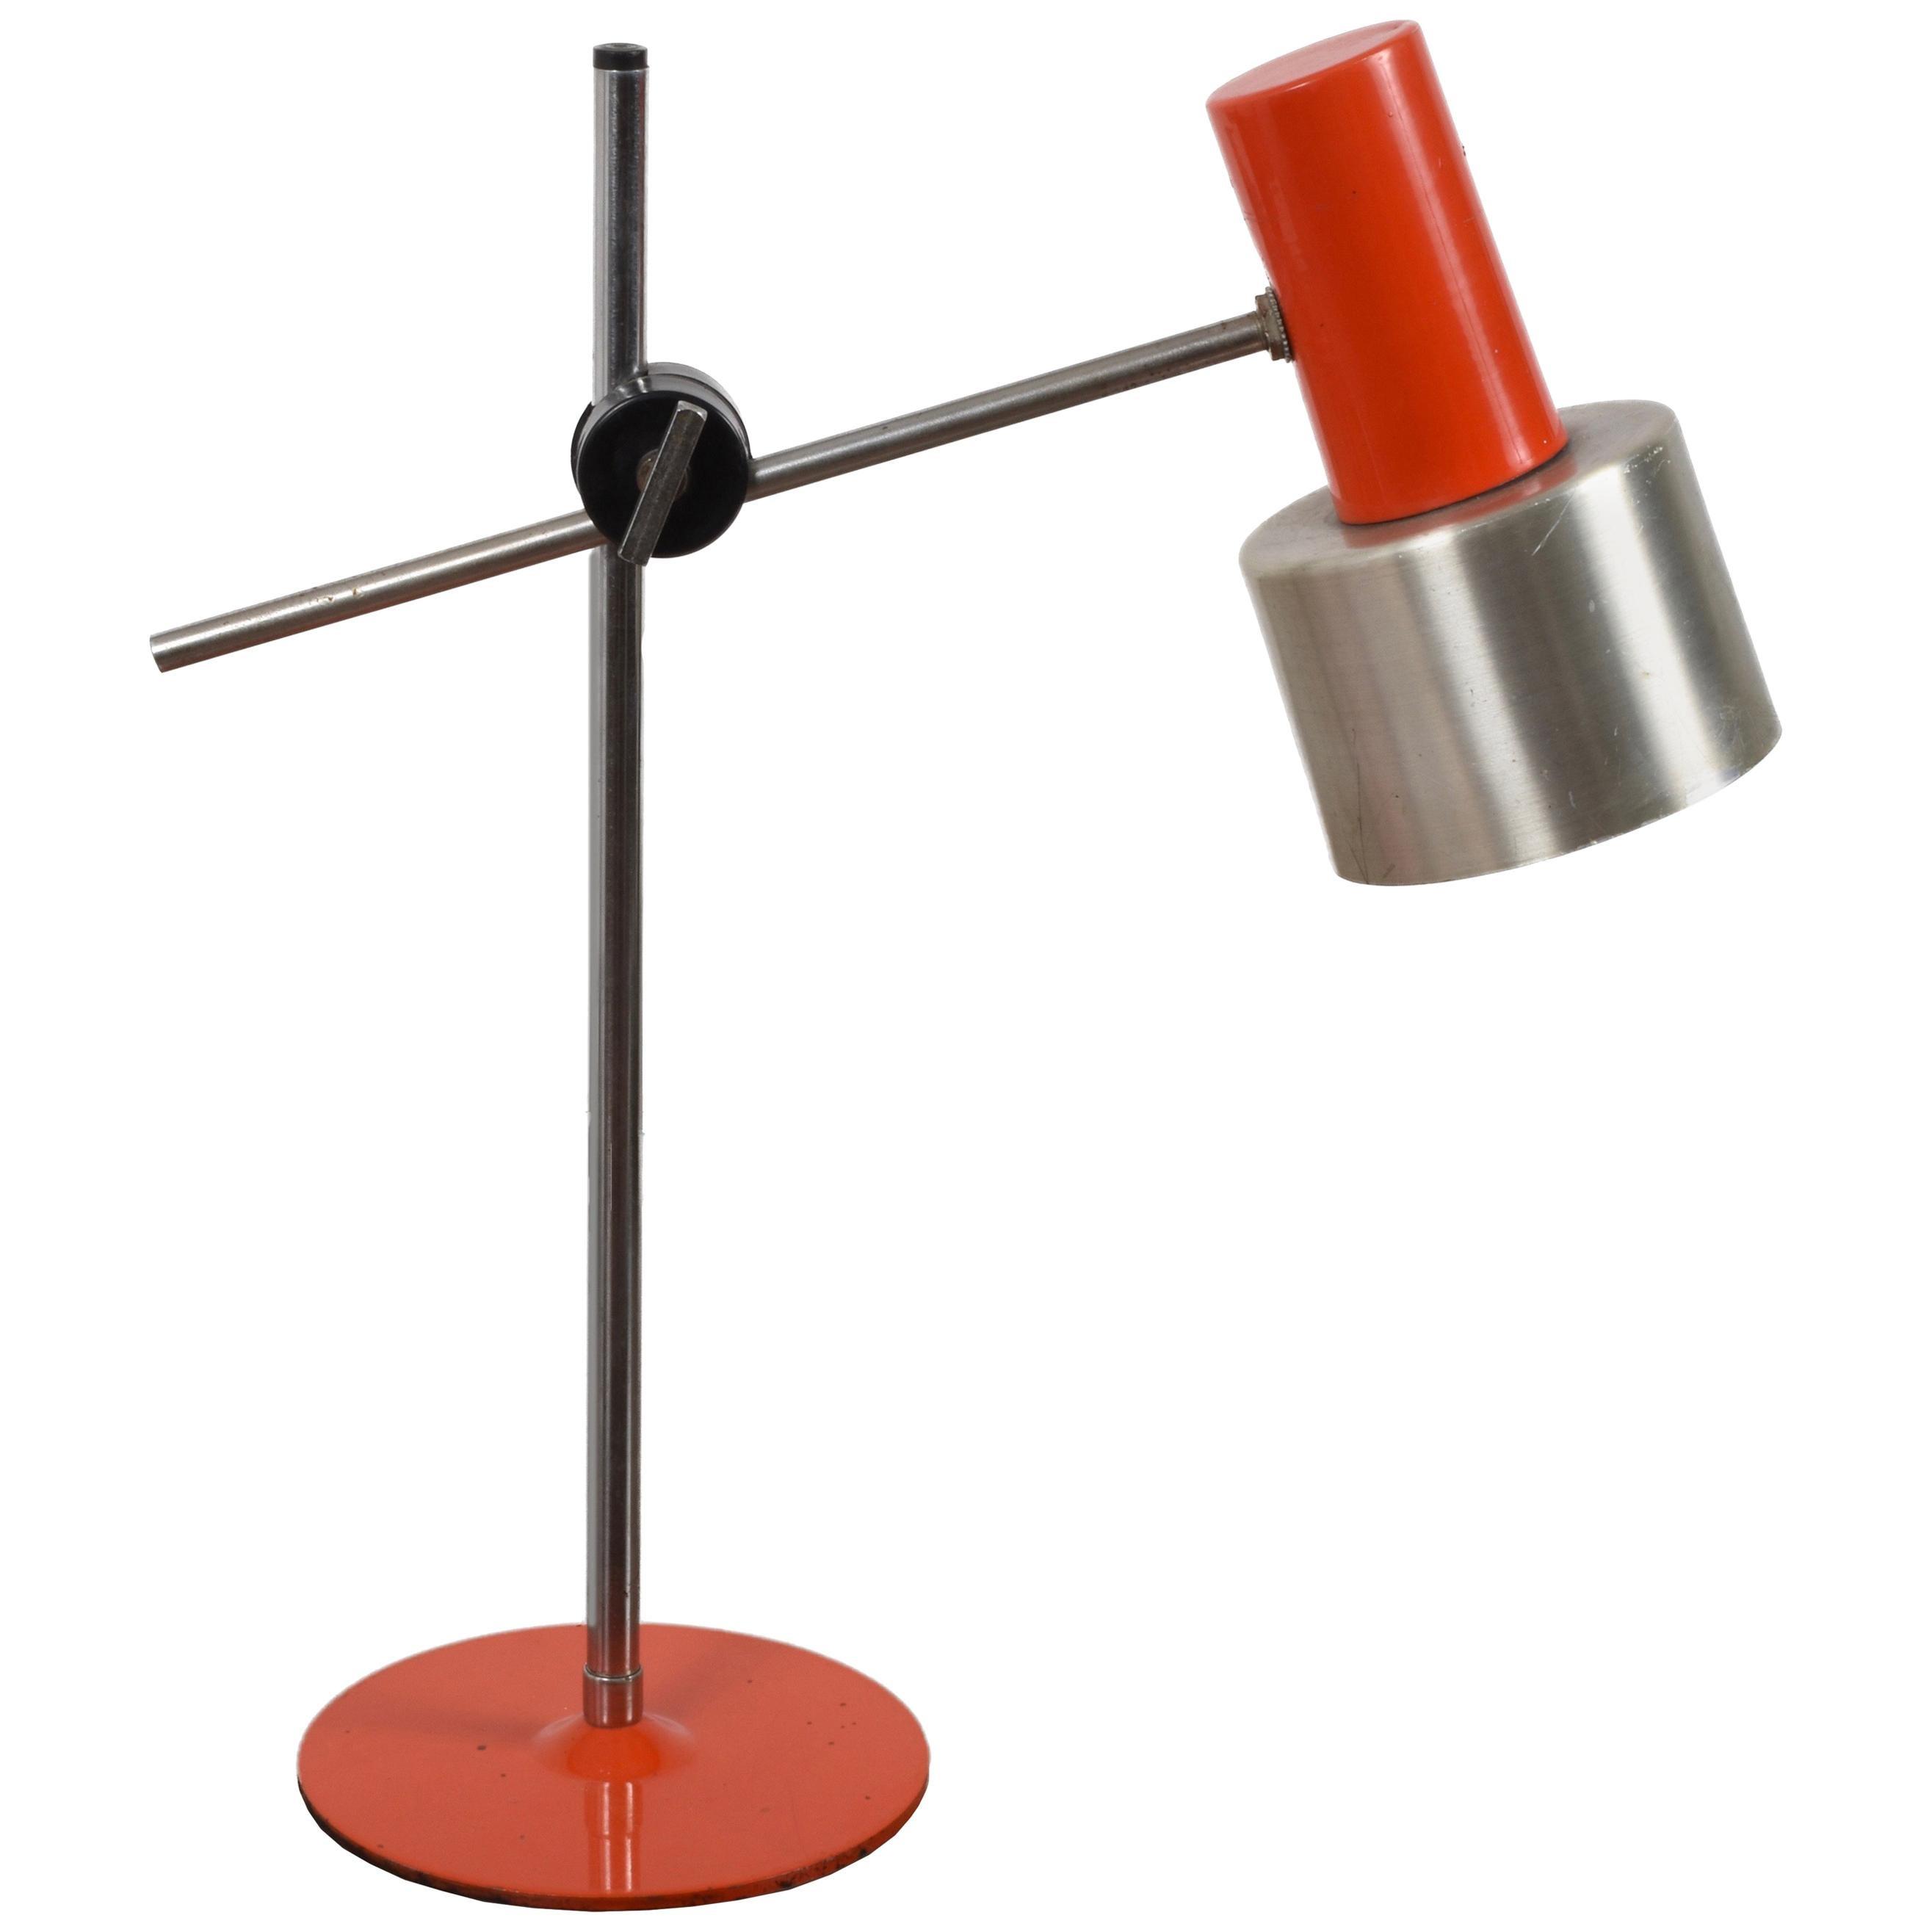 Midcentury Stilnovo Orange Metal and Aluminium Adjustable Table Lamp, 1960s